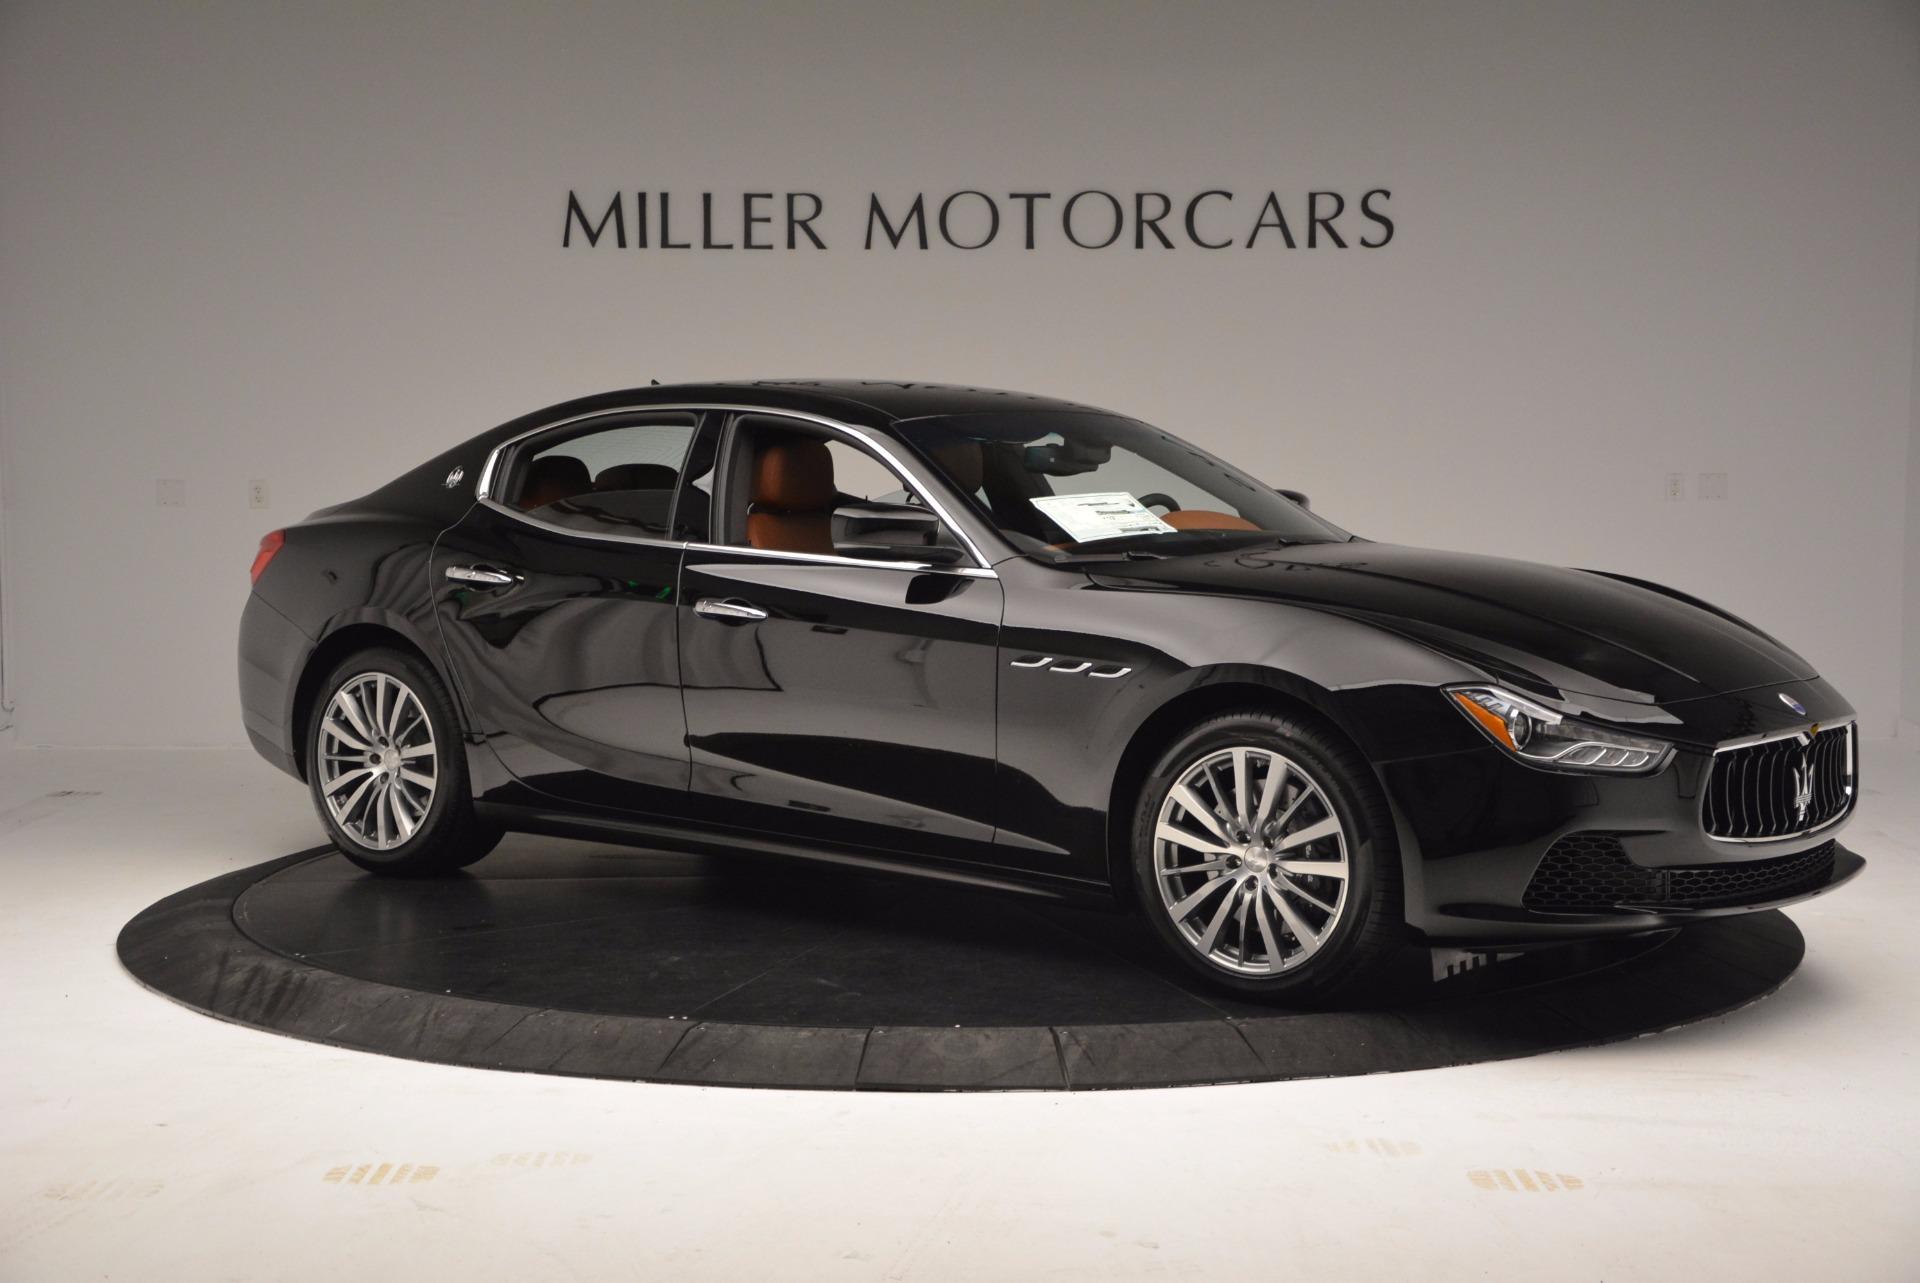 New 2017 Maserati Ghibli S Q4 EX-Loaner For Sale In Greenwich, CT 1116_p10